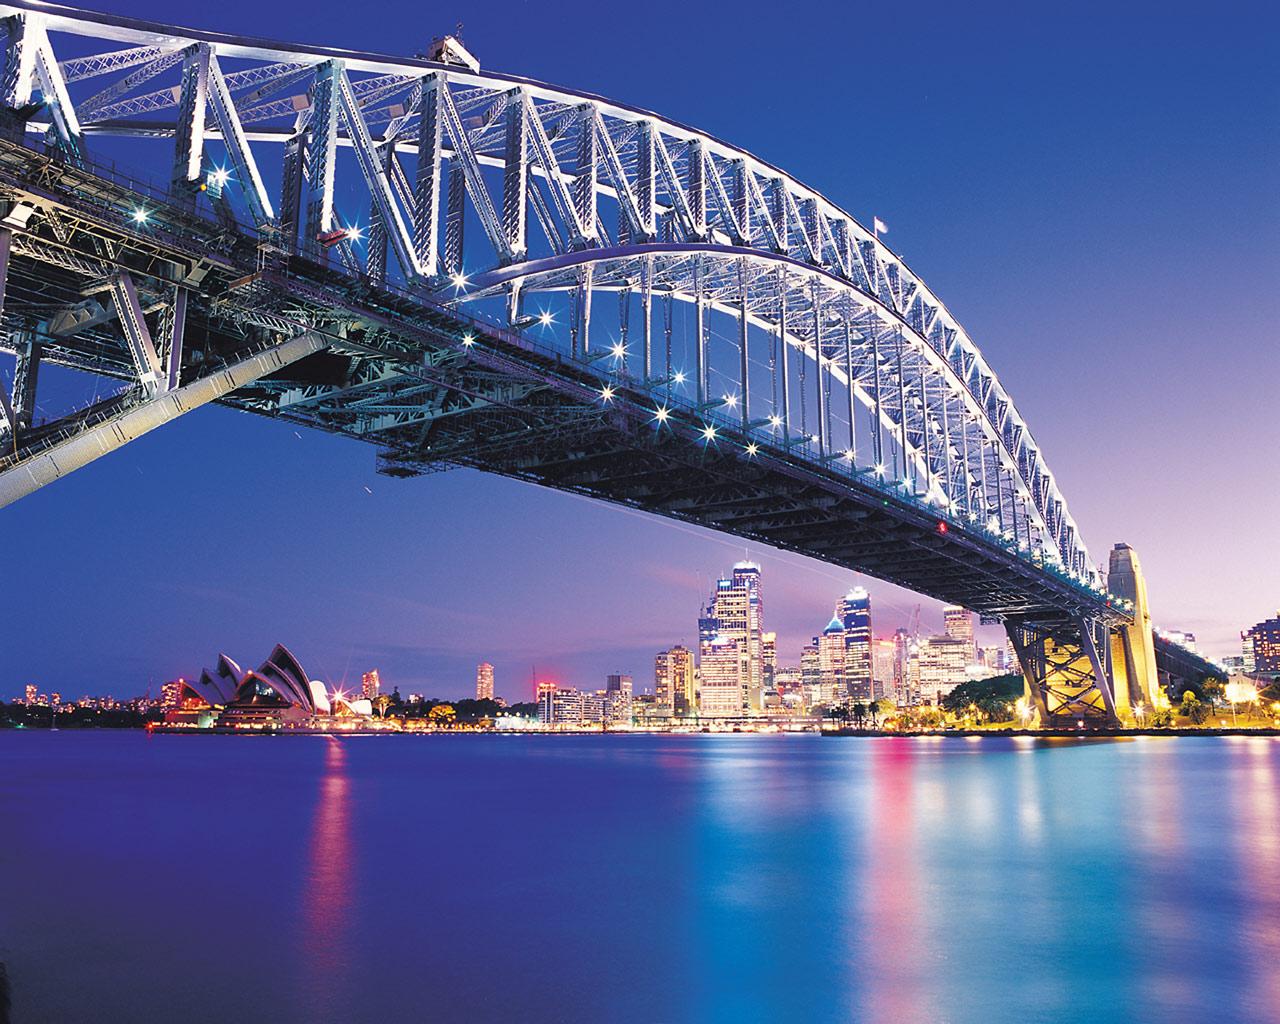 http://4.bp.blogspot.com/-AFHI4mnA3uE/TdPbTeiF5fI/AAAAAAAAO8s/sQgnyIjKBaQ/s1600/Sydney-Bridge-City-Wallpaper.jpg